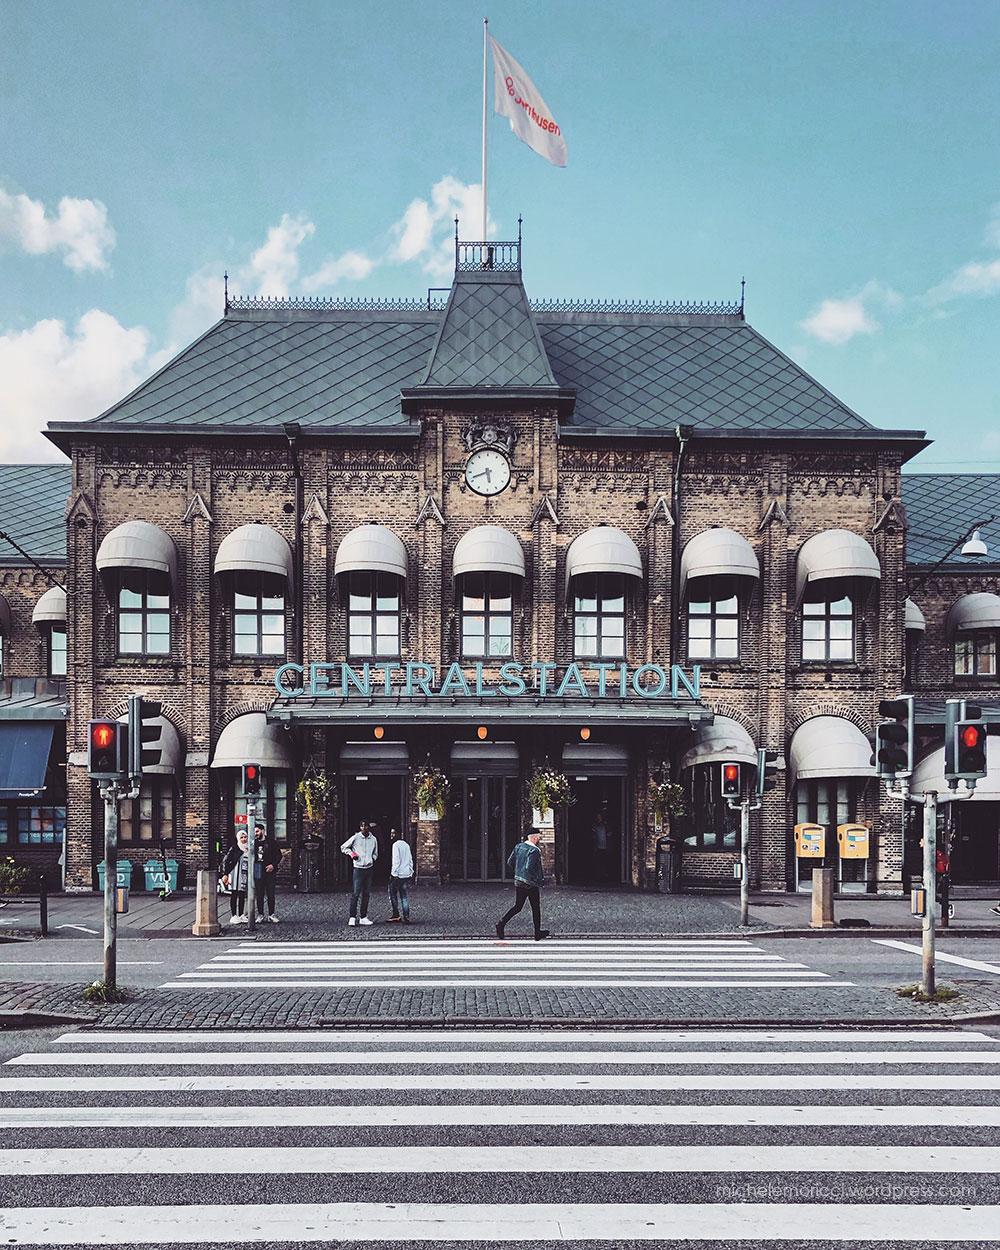 M.Moricci-Gothenburg-2019-01